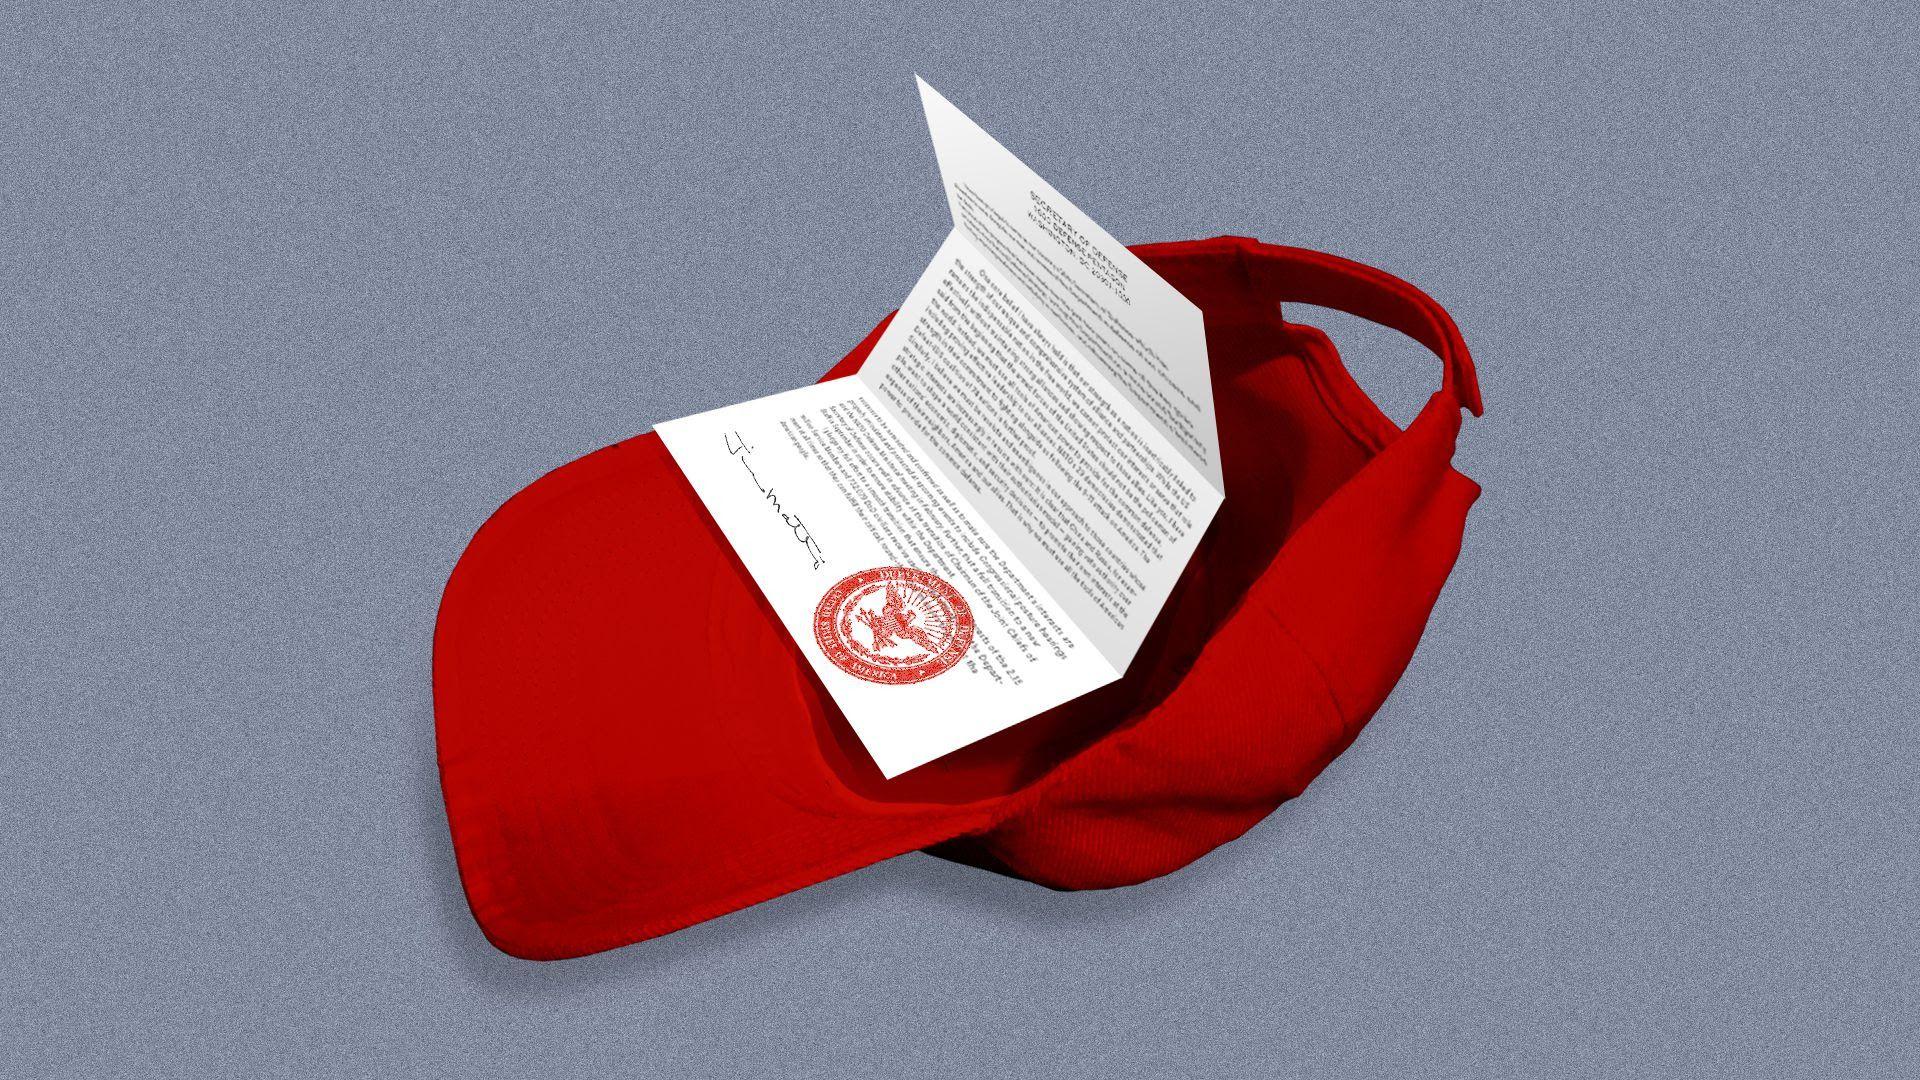 An illustration of Mattis' resignation in a MAGA hat